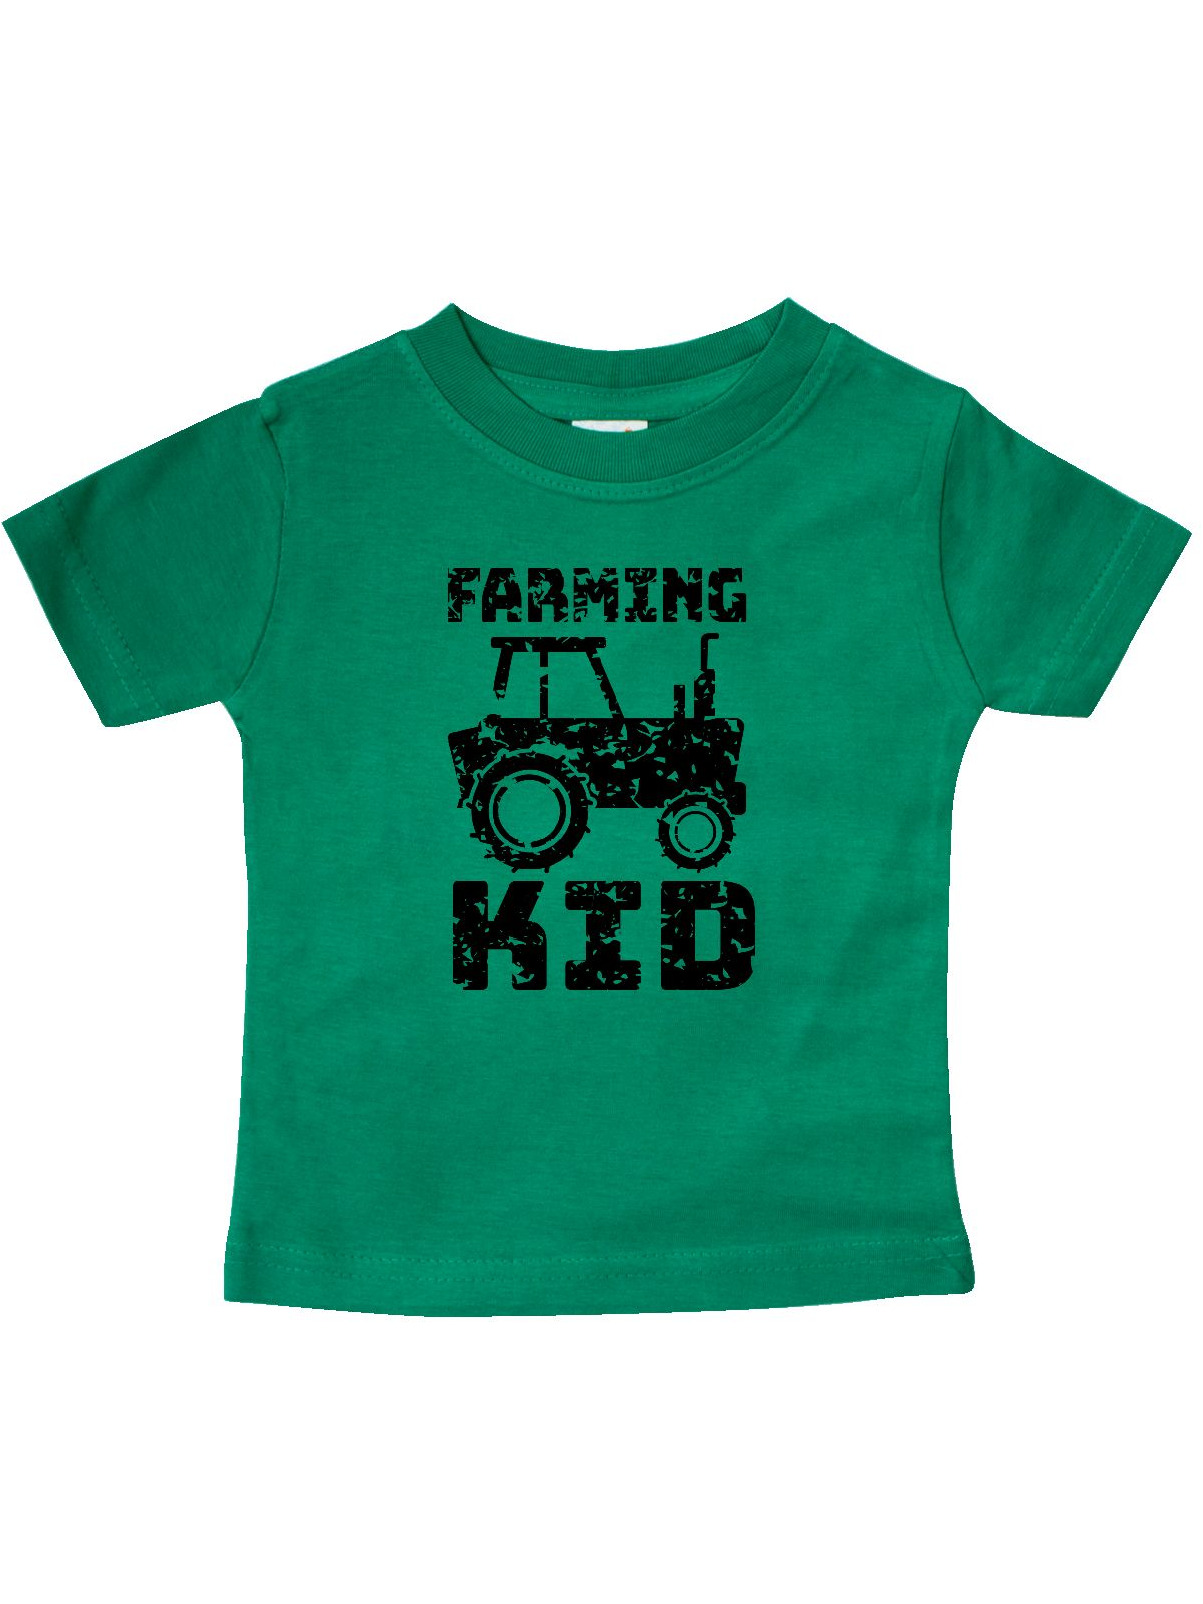 Tractor Distressed Look Baby T-Shirt inktastic Farming Kid